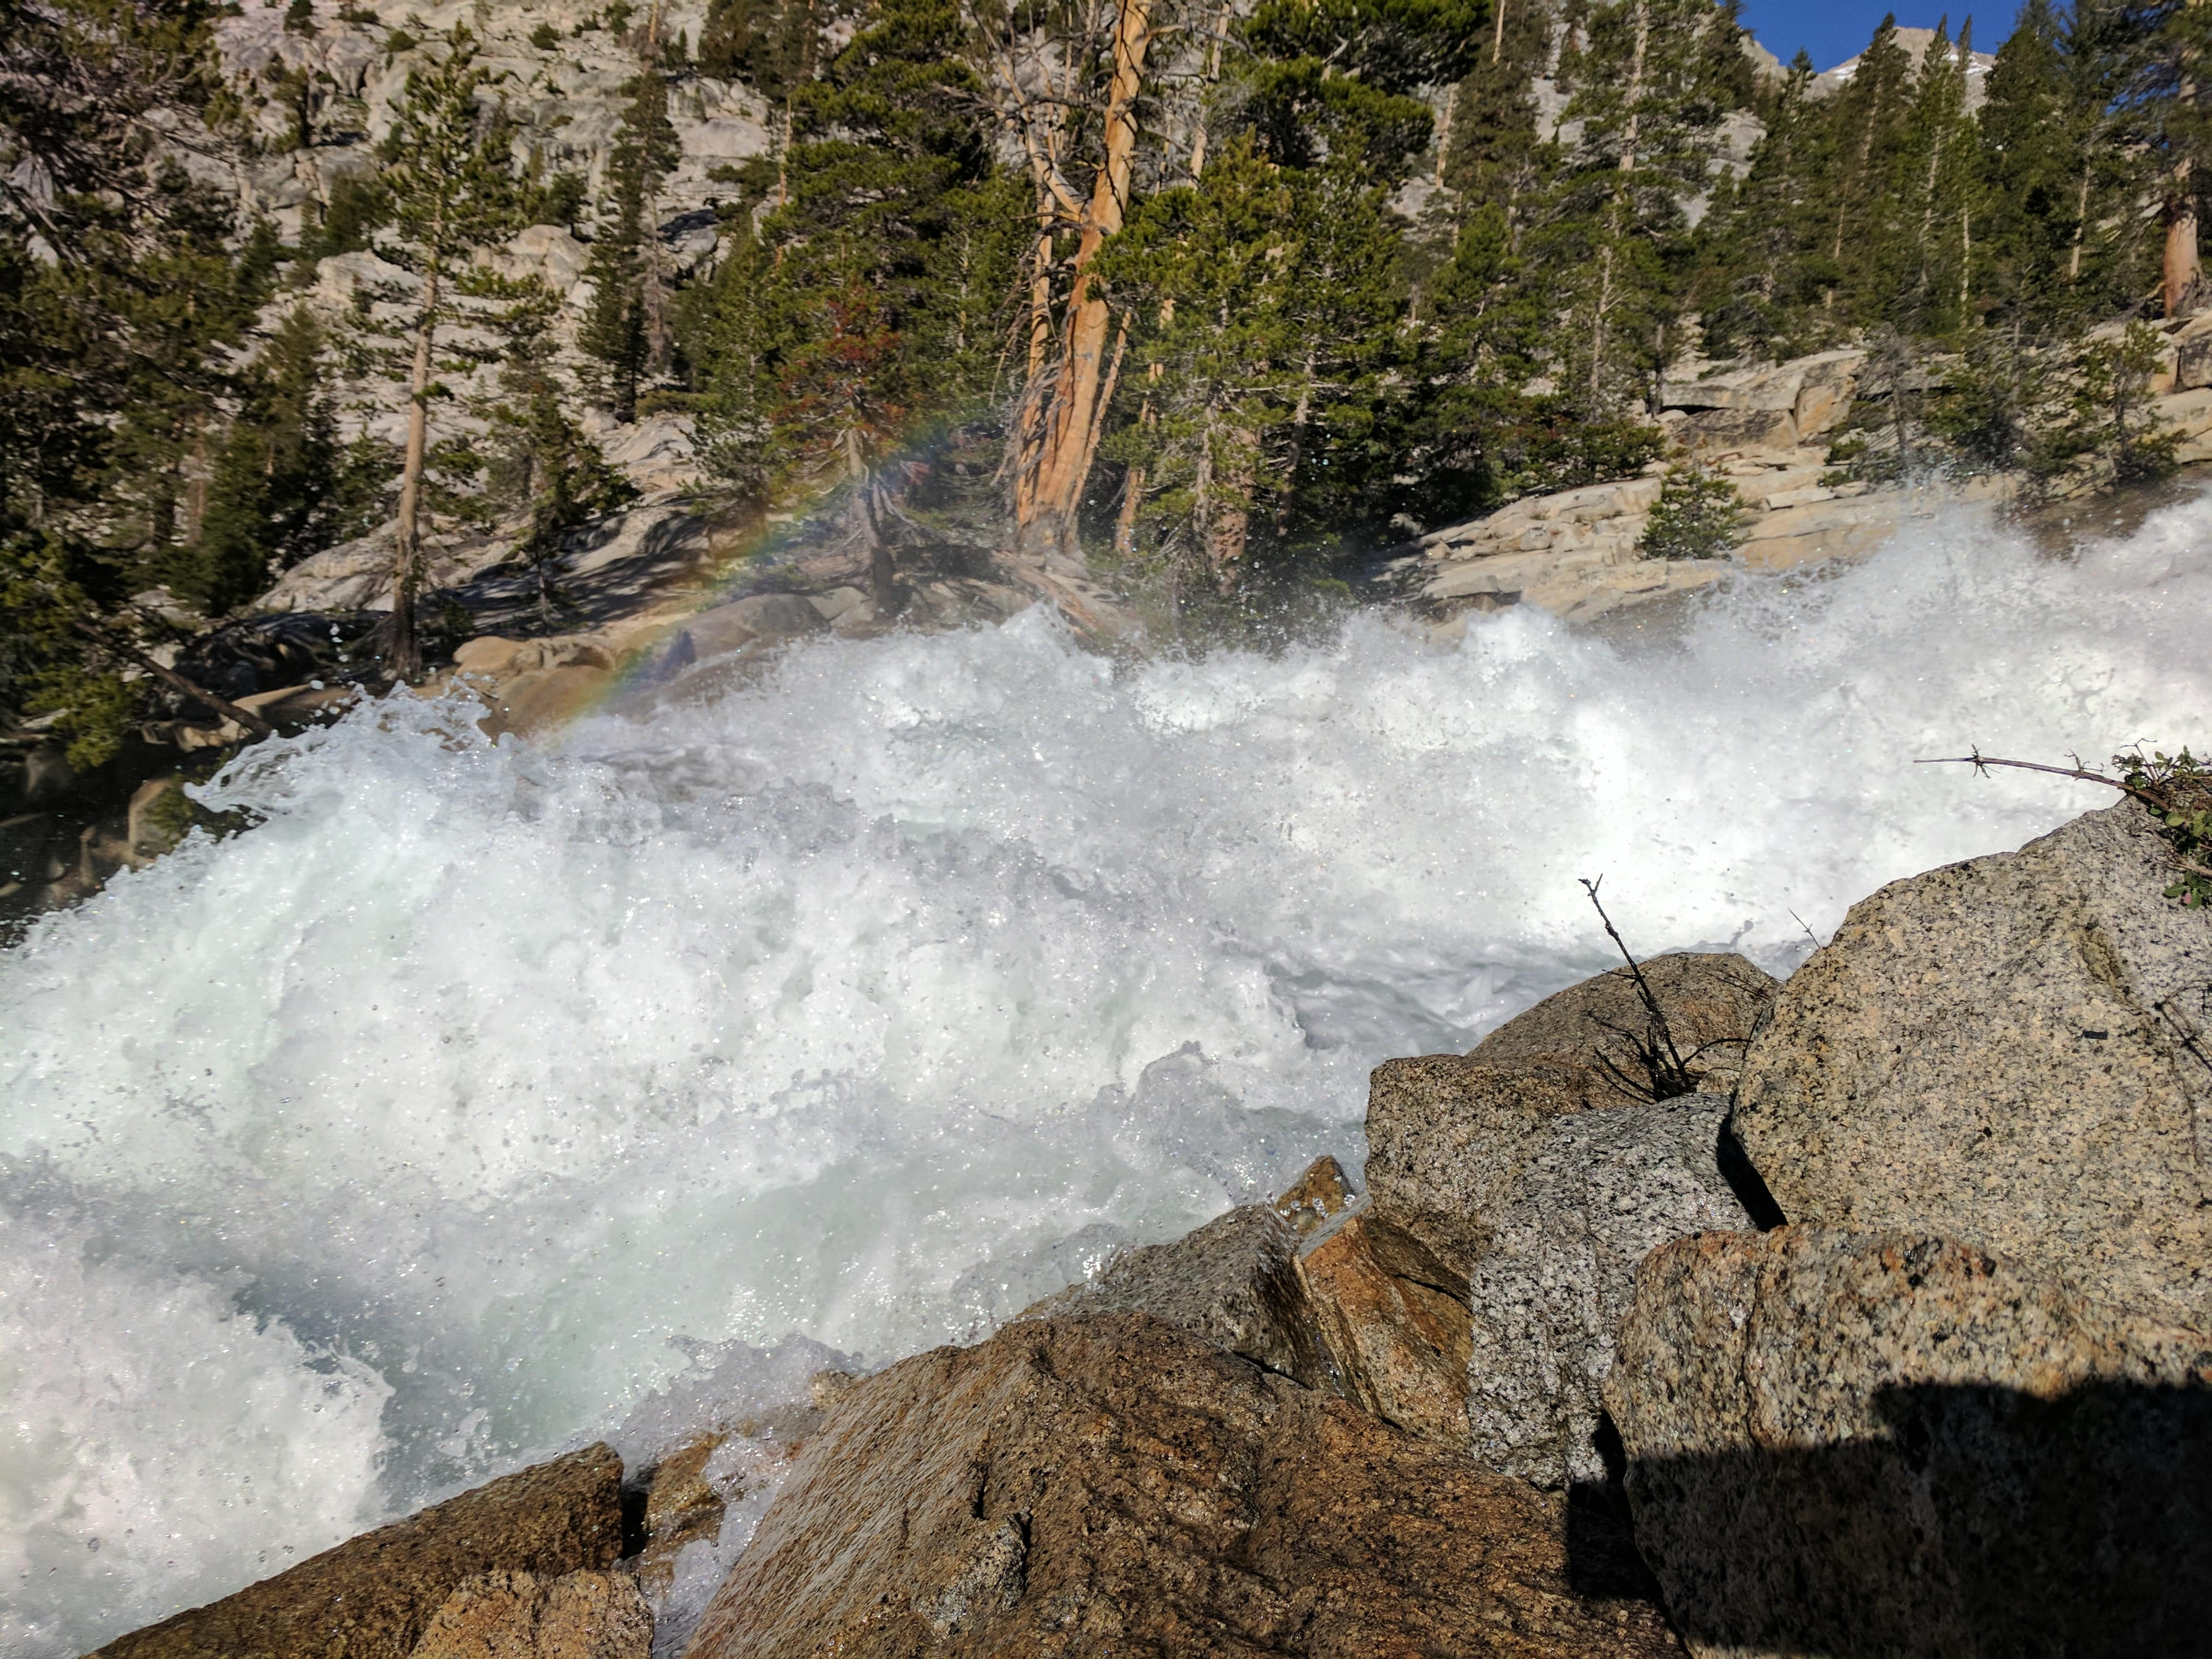 2017 - Trans-Sierra Xtreme Challenge, massive rapids on Kern Kaweah river drainage